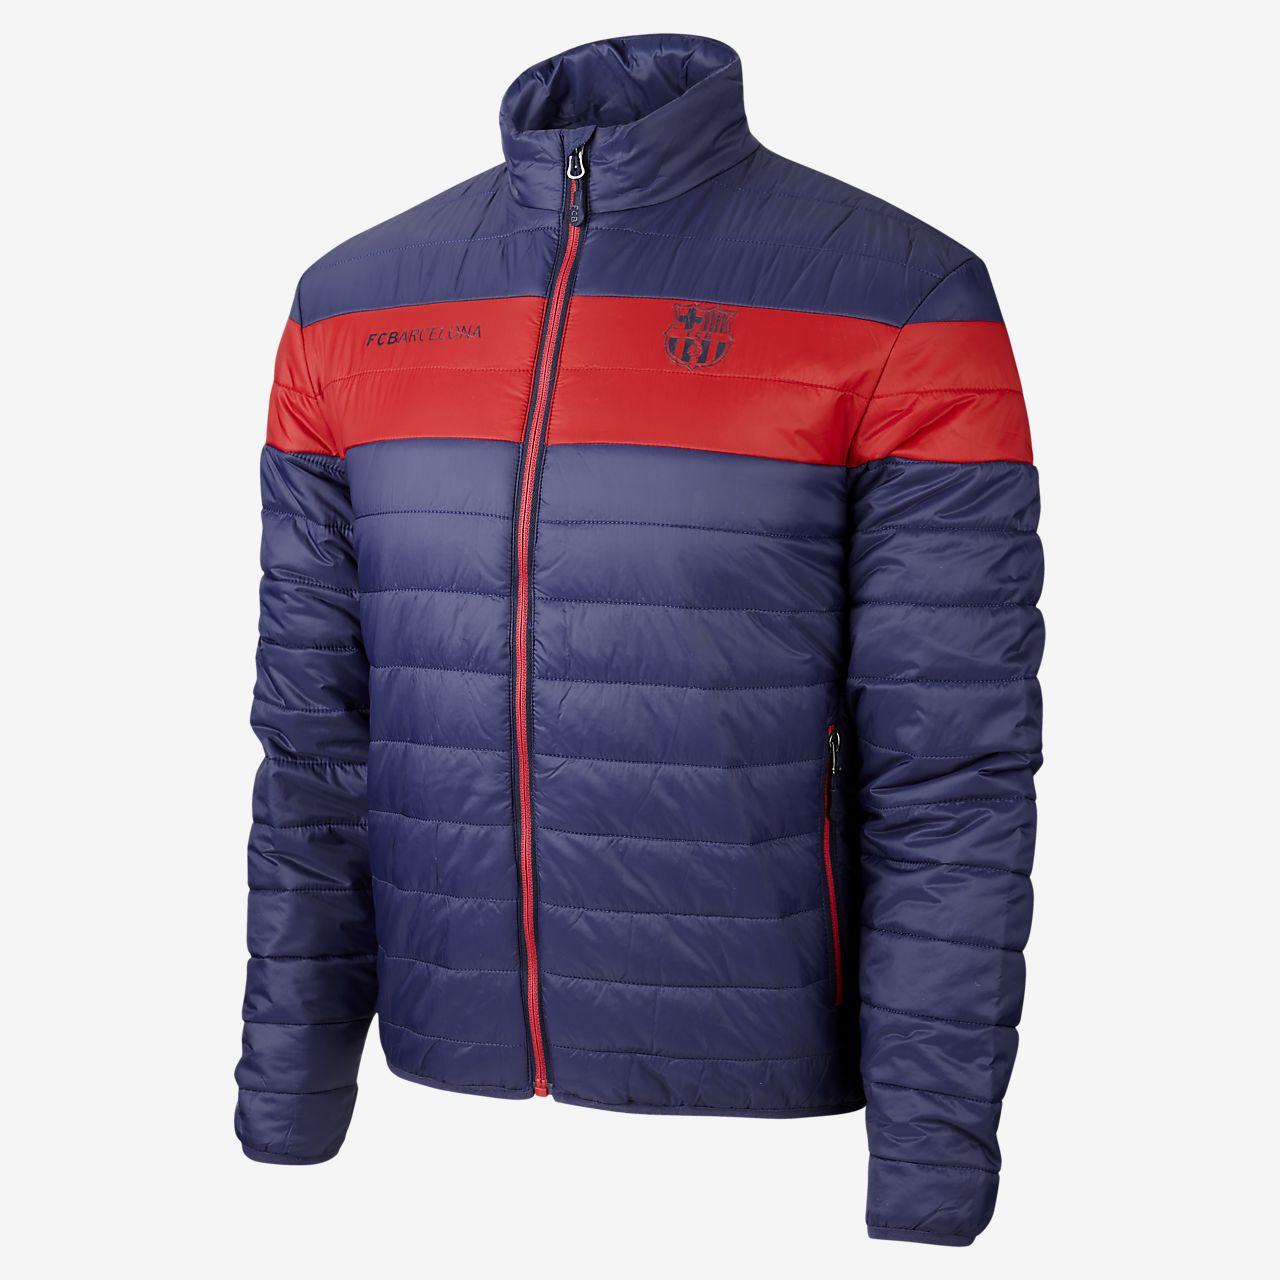 9df2ba7e5575 FC Barcelona Padded Men s Jacket. Nike.com GB